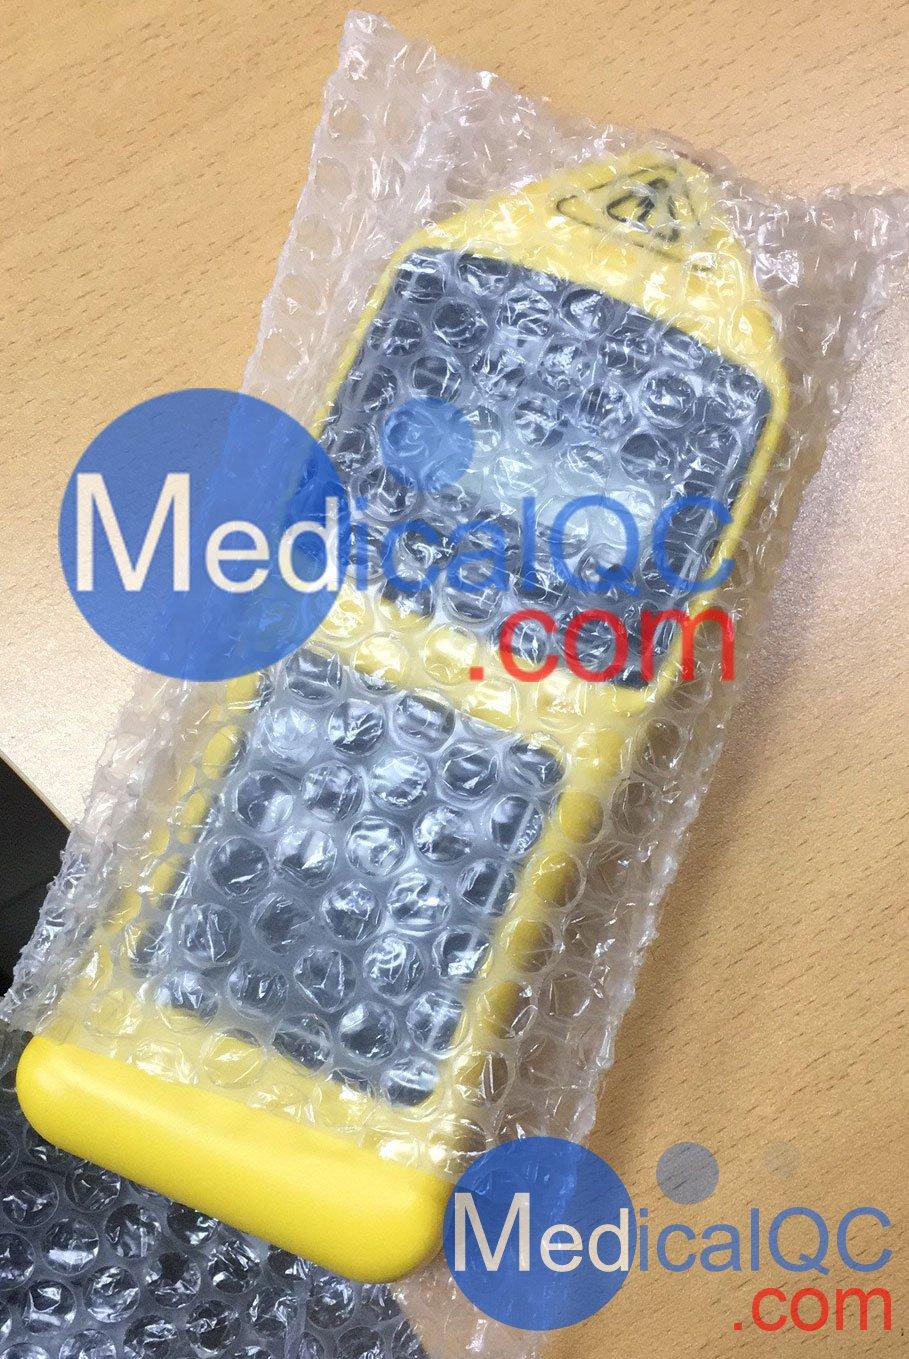 McGan MM513,MM513绝缘检测仪,美国McGan MM513医用手持式绝缘检测仪